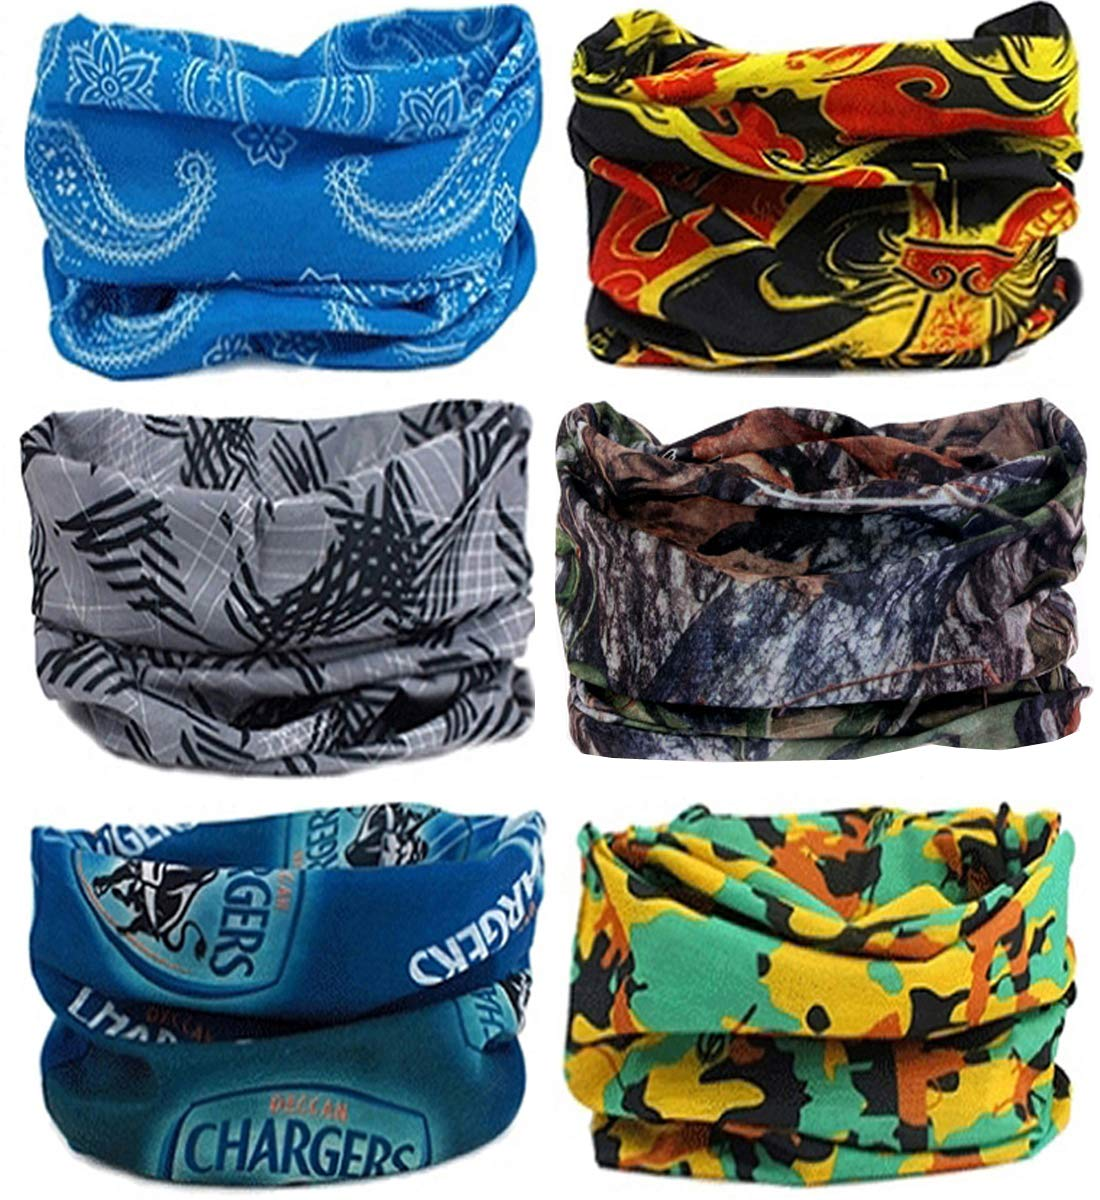 SmilerSmile 6pcs Assorted Seamless Outdoor Sport Bandanna Headwrap Scarf Wrap, 12 in 2 High Elastic Magic Headband & Collars Muffler Scarf Face Mask UV Resistance(32 Print2)